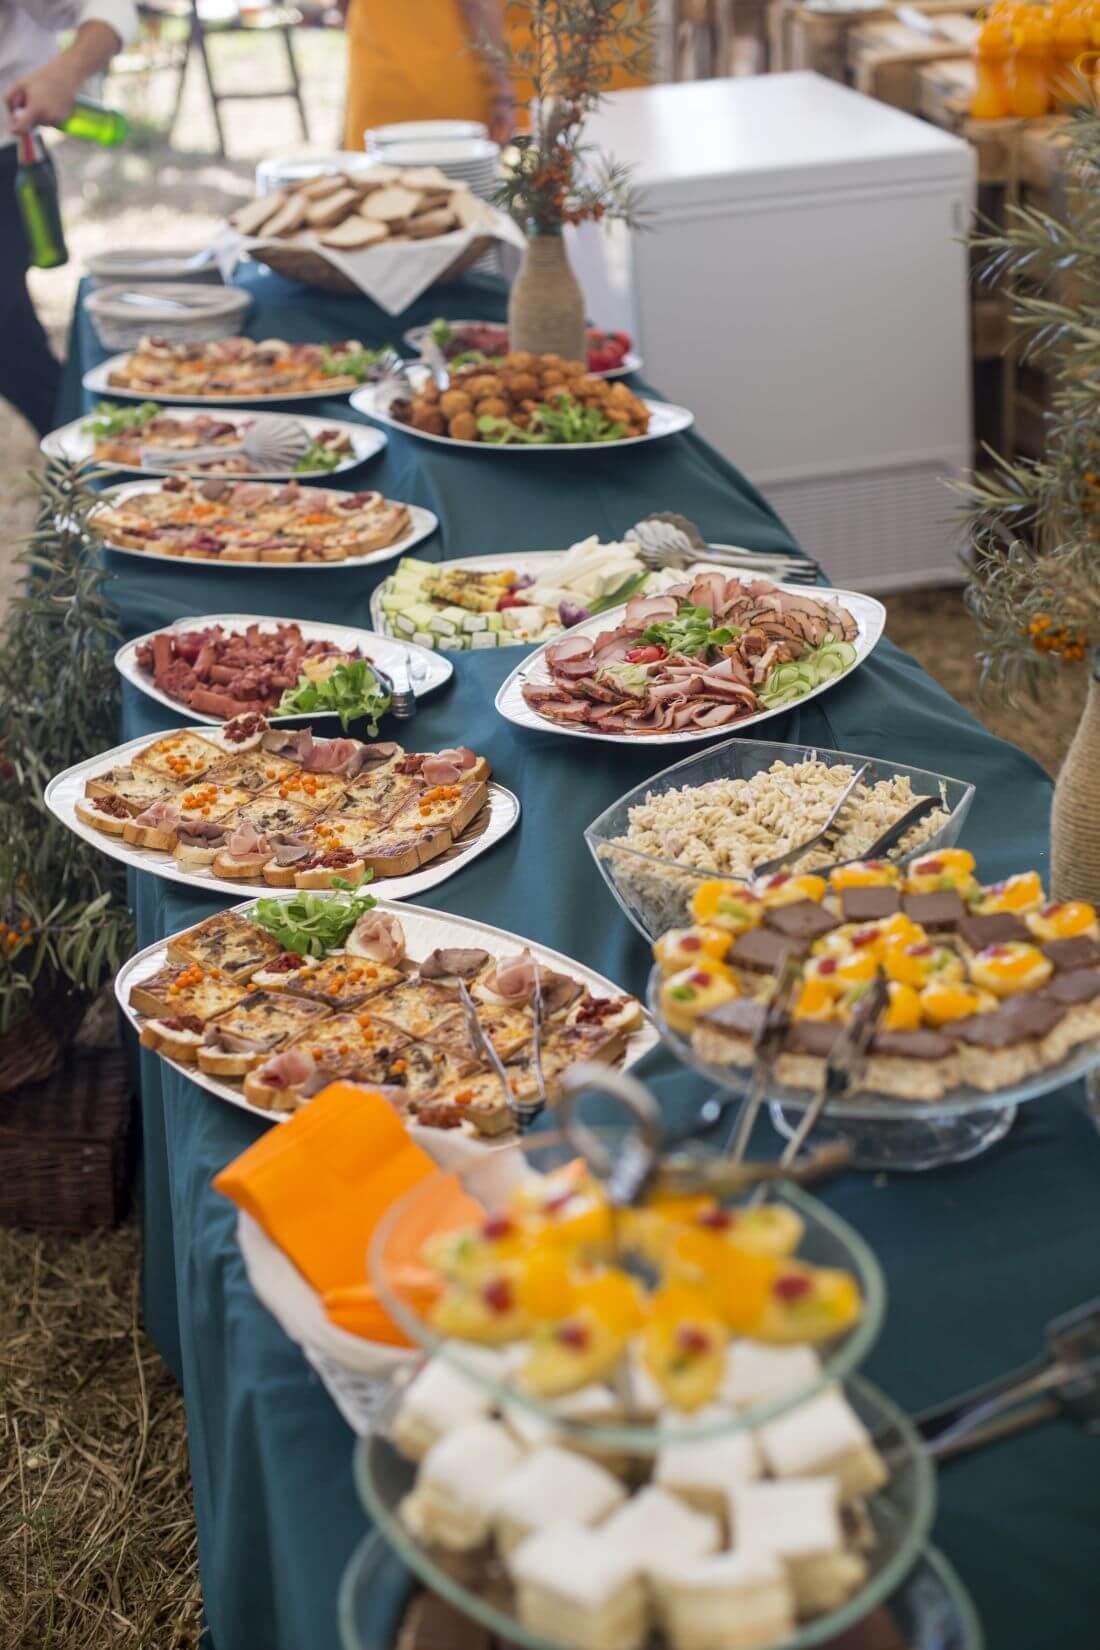 Catering Evenimente - In Bucate Catering - Festivalul Catinei Gaiesti - 1170px - 13